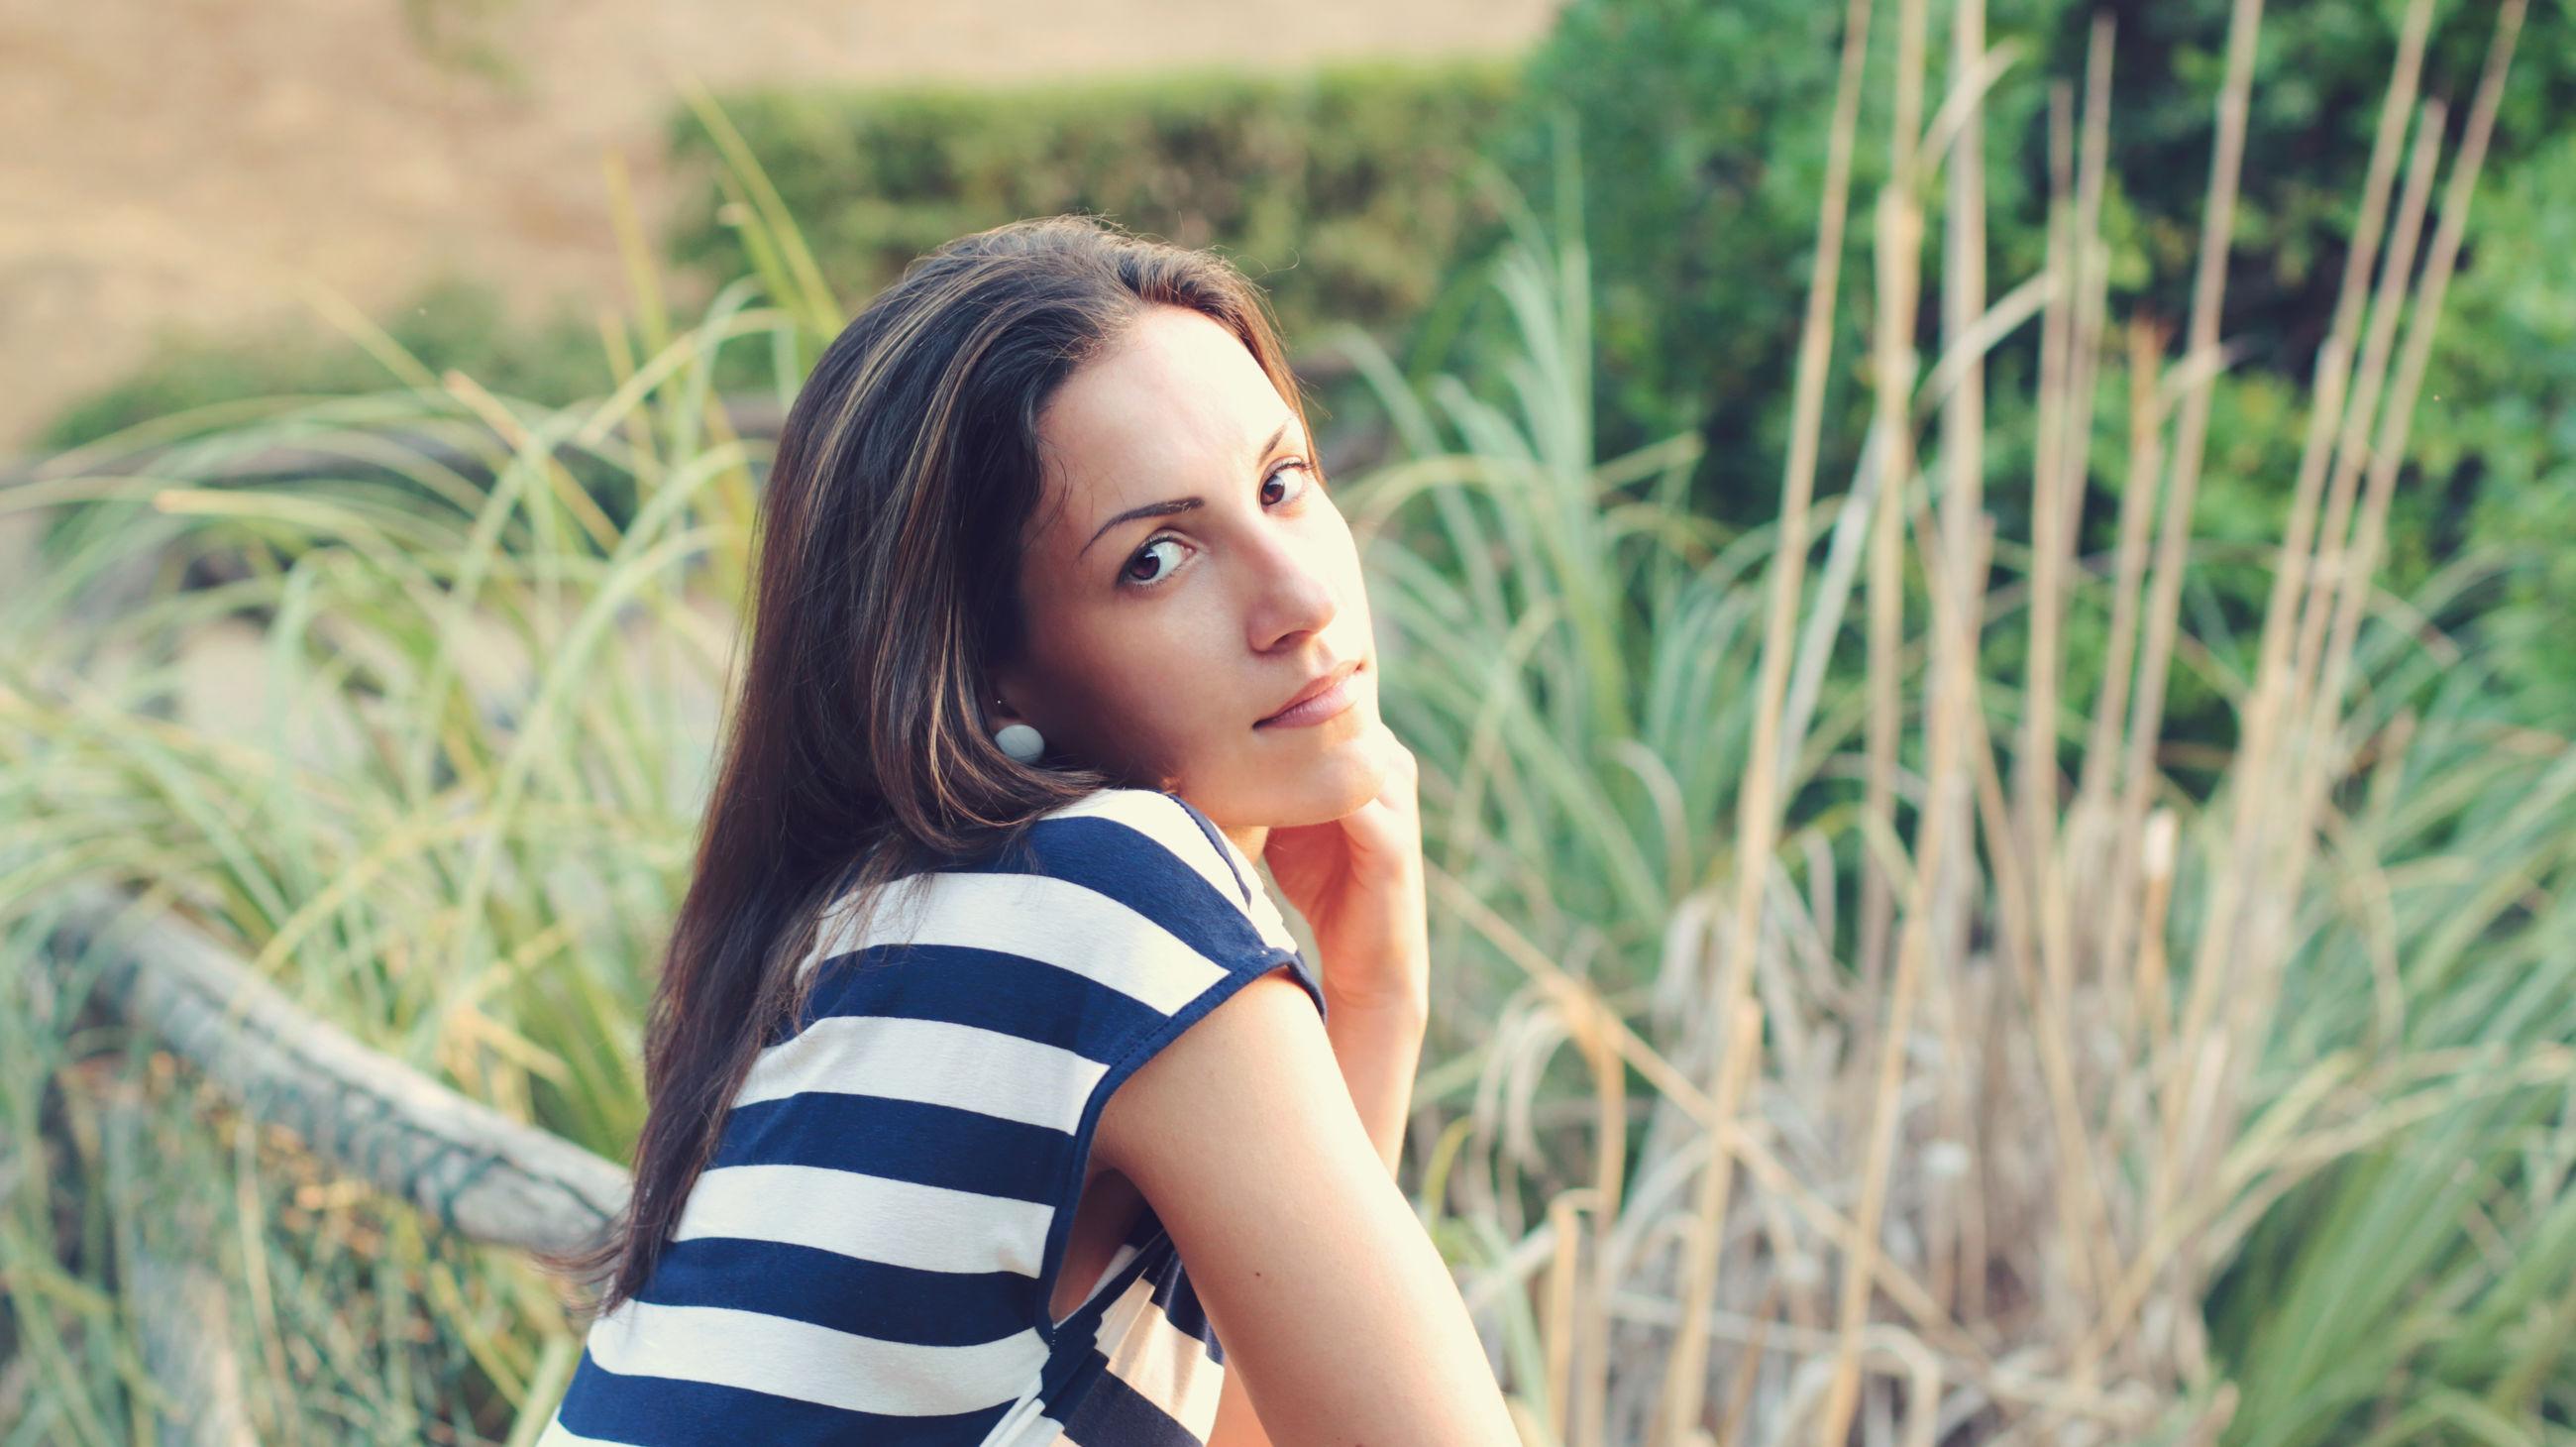 Portrait of young woman against plants at park